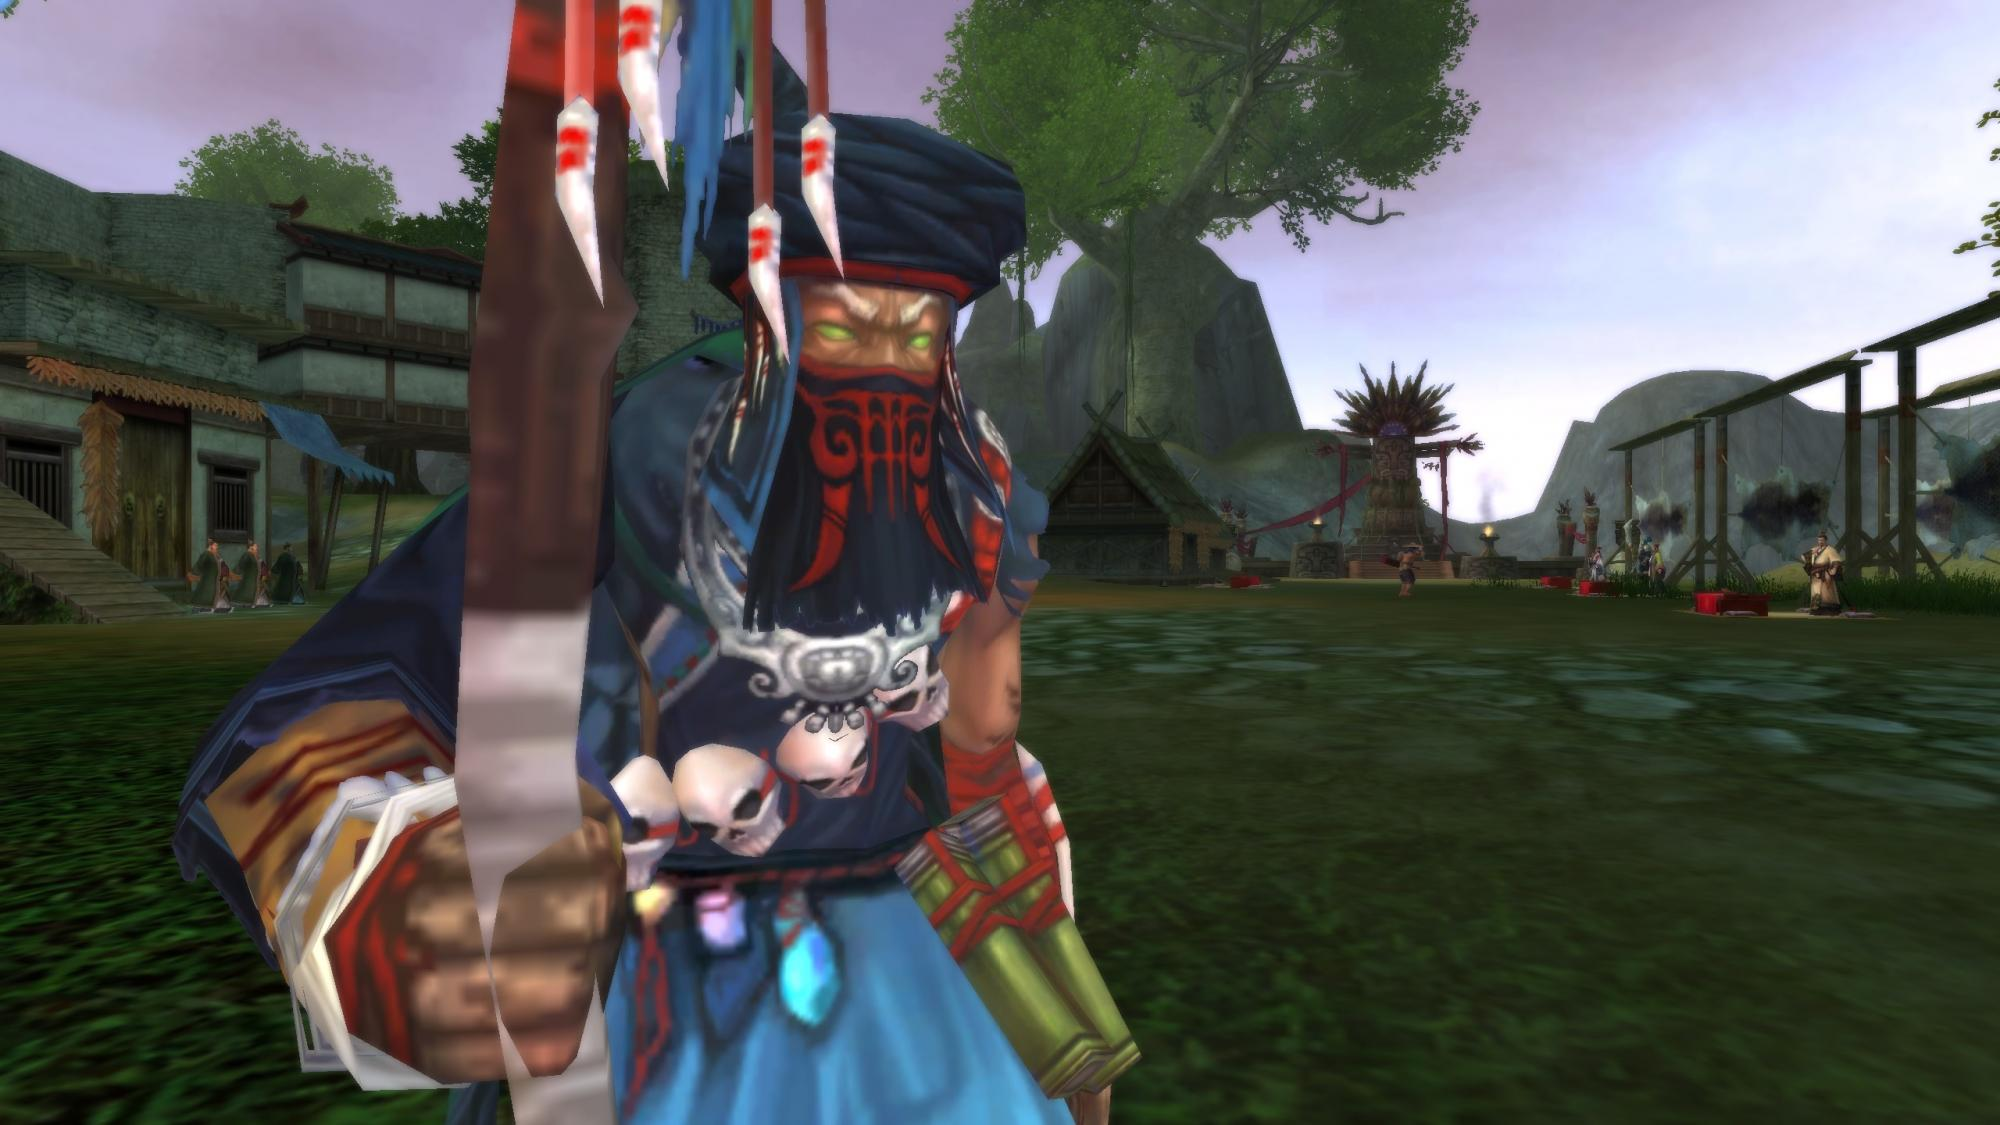 Click image for larger version.Name:Heroes of Three Kingdoms 1.jpgViews:172Size:190.2 KBID:795